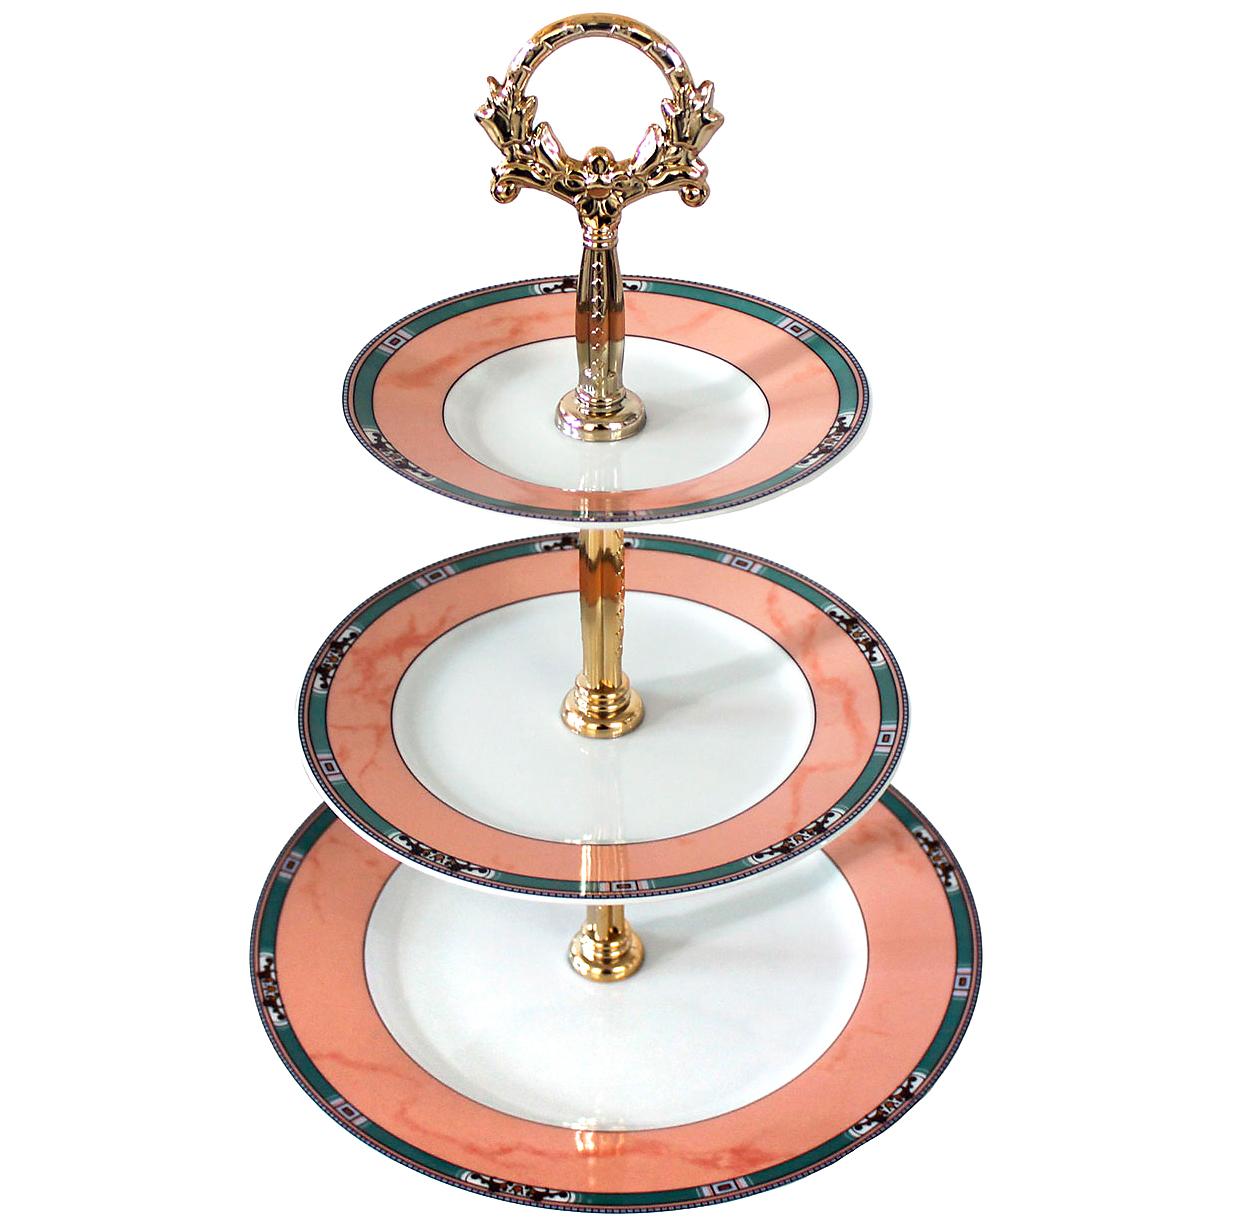 Этажерка 3-х ярусная Thun Cairo Розовый декор, мини кант